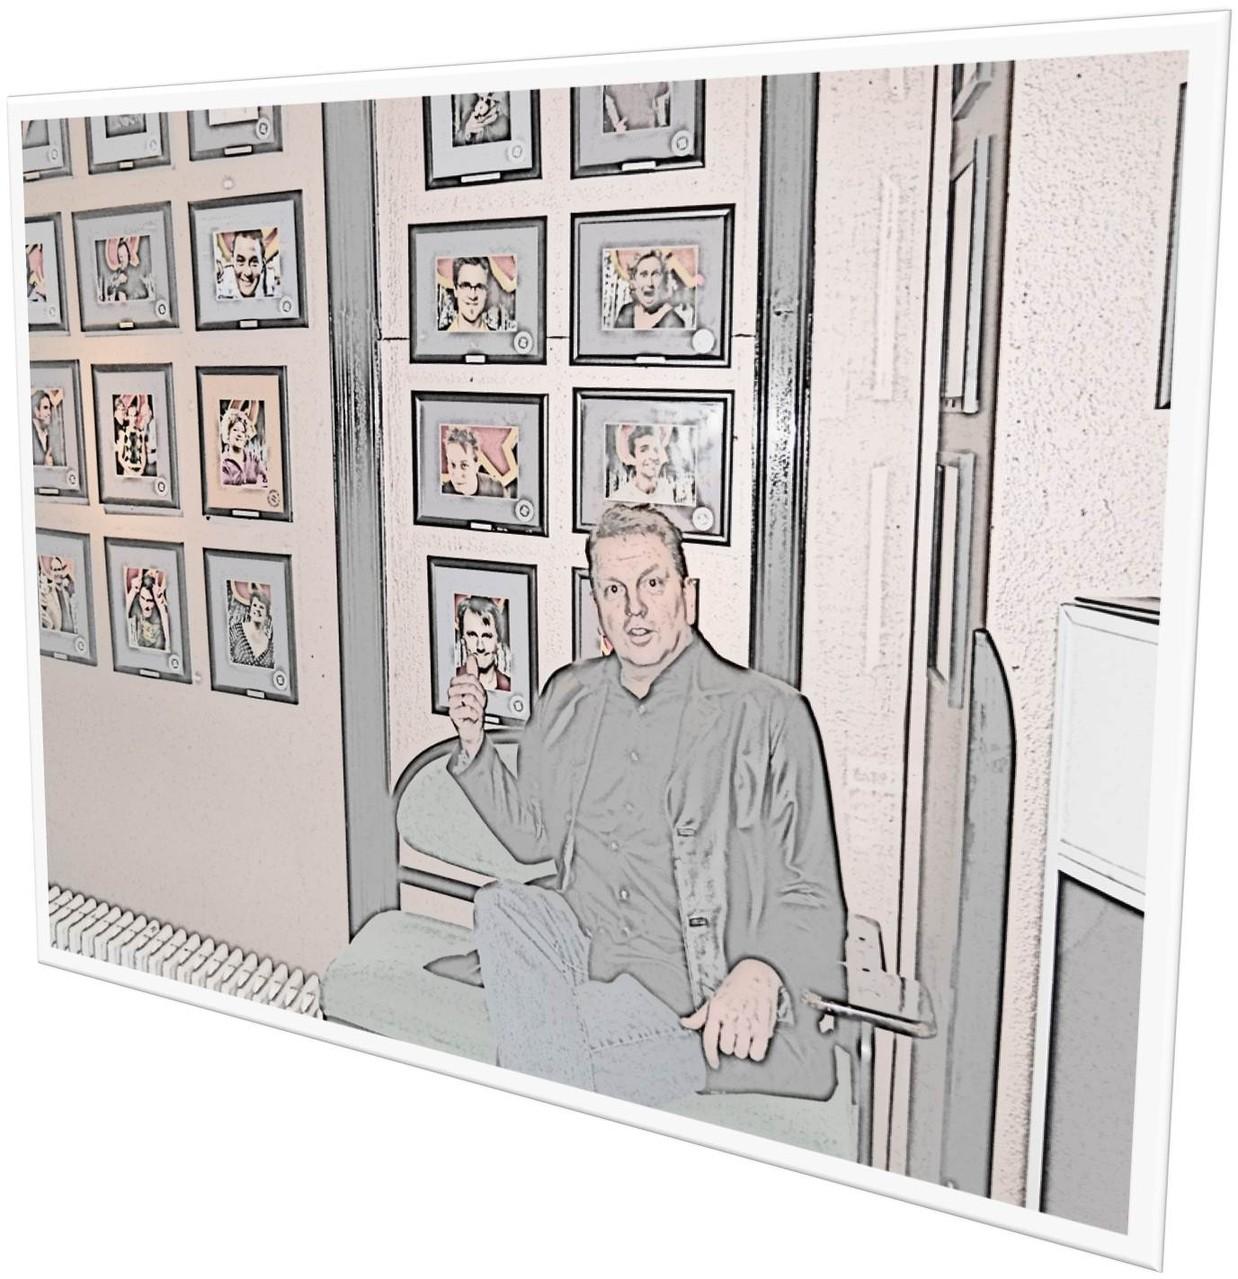 Irgendwann hängt mein Bild auch da - an der Wand.    (c) silvia ricker